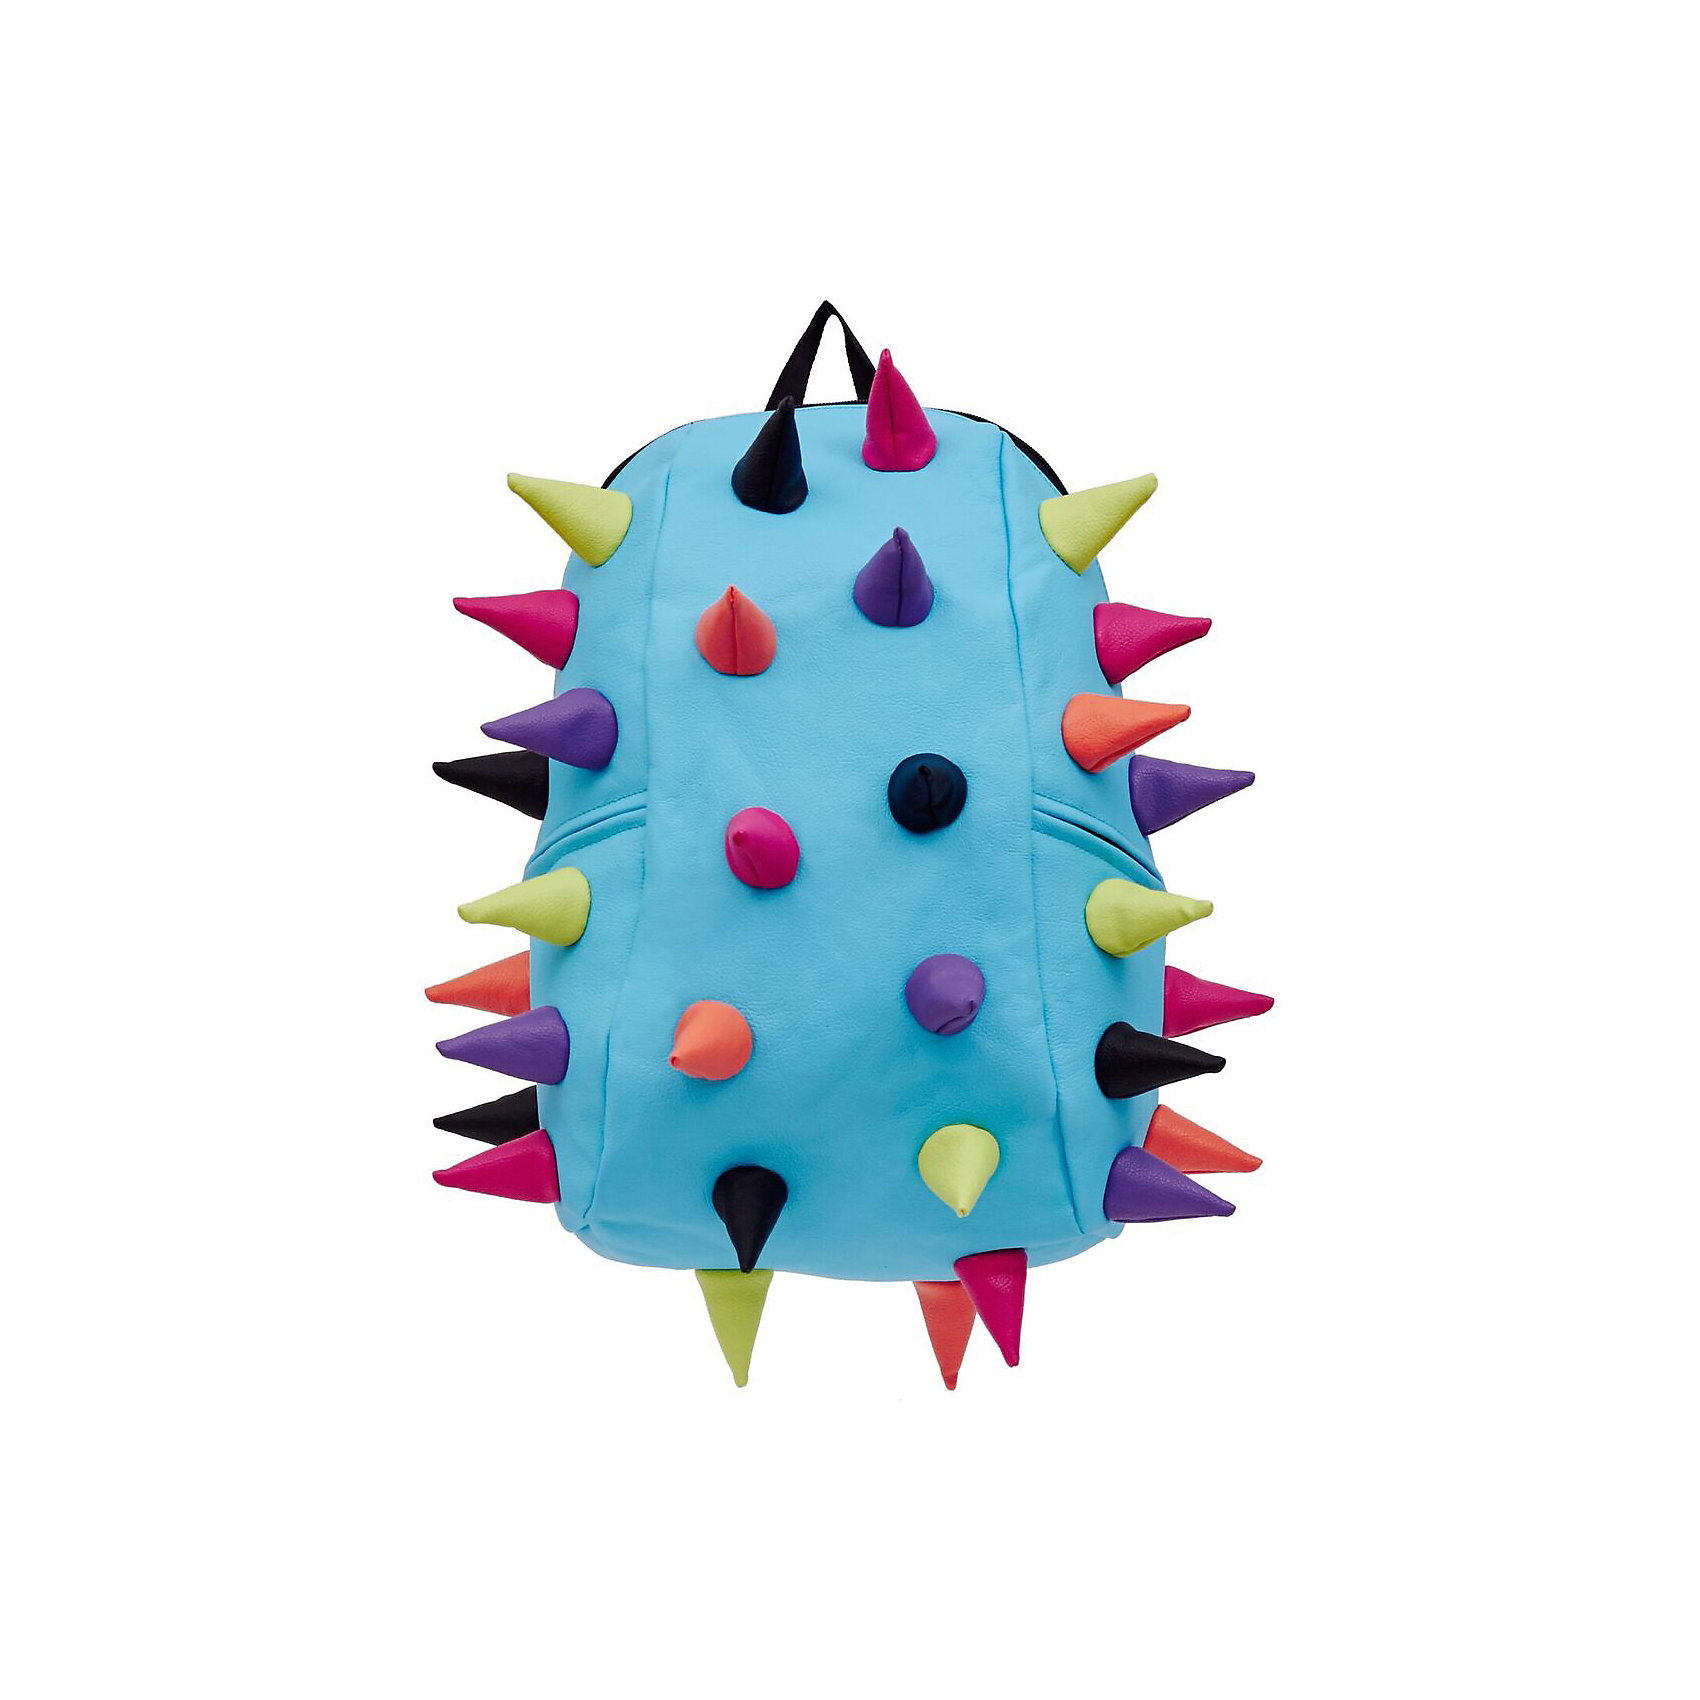 Рюкзак Rex 2 Full Whirpool, цвет голубой мультиРюкзаки<br>Вес: 0,8 кг<br>Размер: 46х35х20 см<br>Состав: рюкзак<br>Наличие светоотражающих элементов: нет<br>Материал: полиуретан<br><br>Ширина мм: 460<br>Глубина мм: 350<br>Высота мм: 200<br>Вес г: 800<br>Возраст от месяцев: 60<br>Возраст до месяцев: 720<br>Пол: Унисекс<br>Возраст: Детский<br>SKU: 7054072